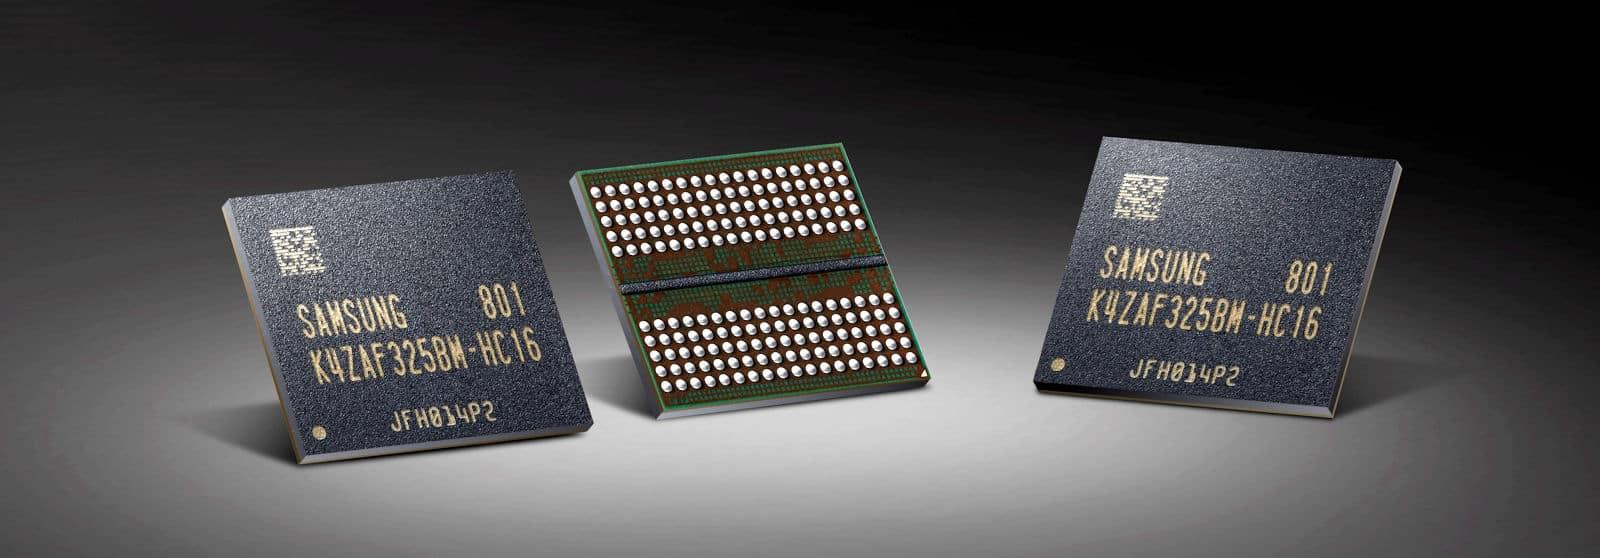 Samsung 16 Gigabit GDDR6   P1 1 - Samsung inizia a produrre le memorie GDDR6 da 16-Gigabit